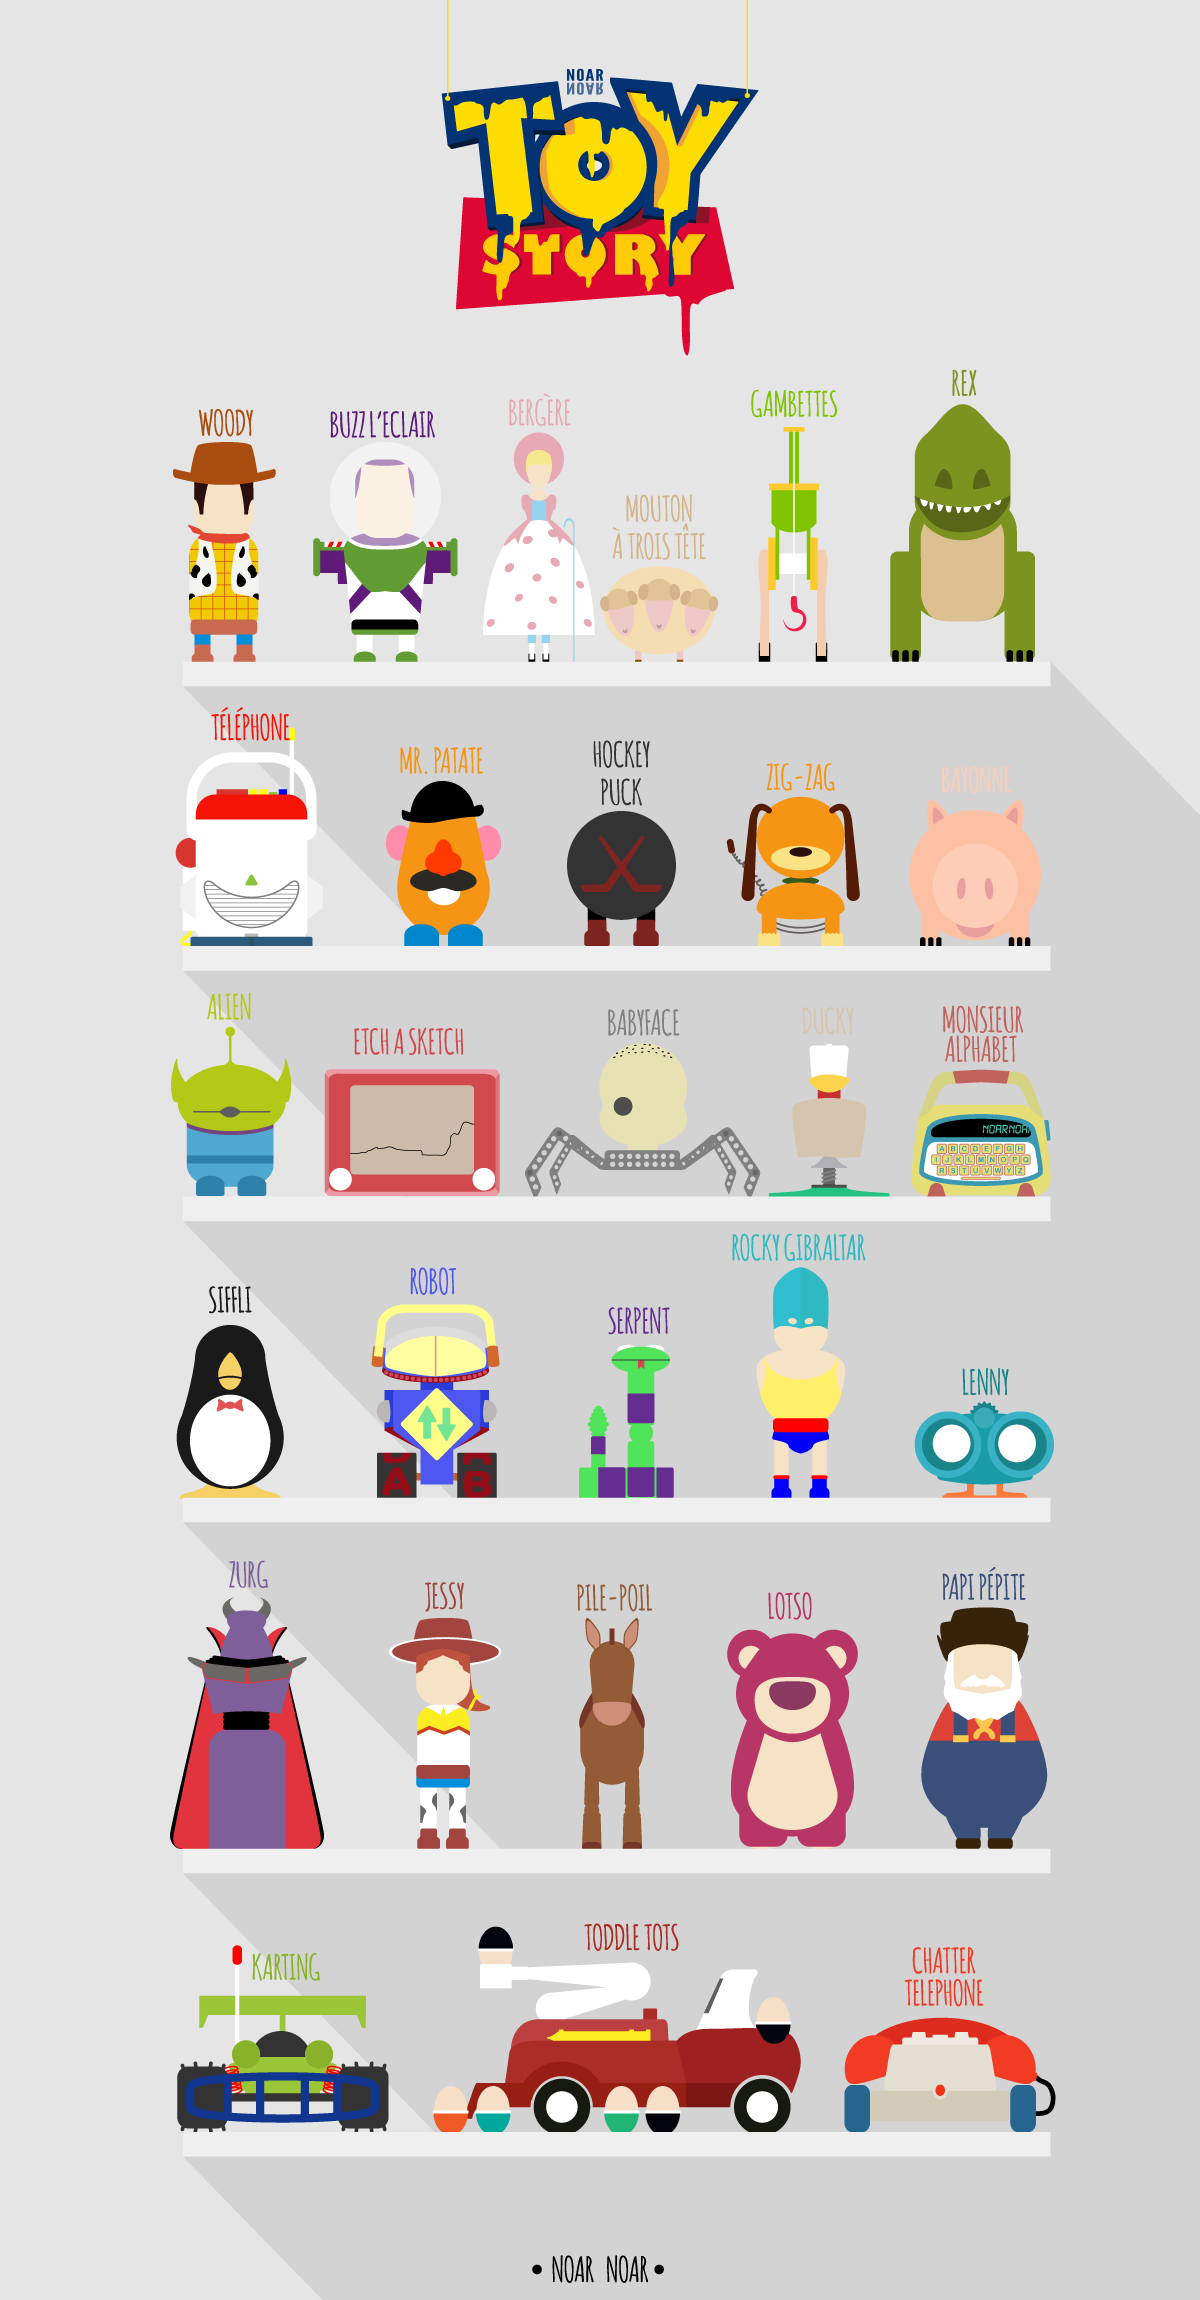 Wallpaper iphone toy story - Noar Toy Story Disney Wallpaperdisney Postersiphone